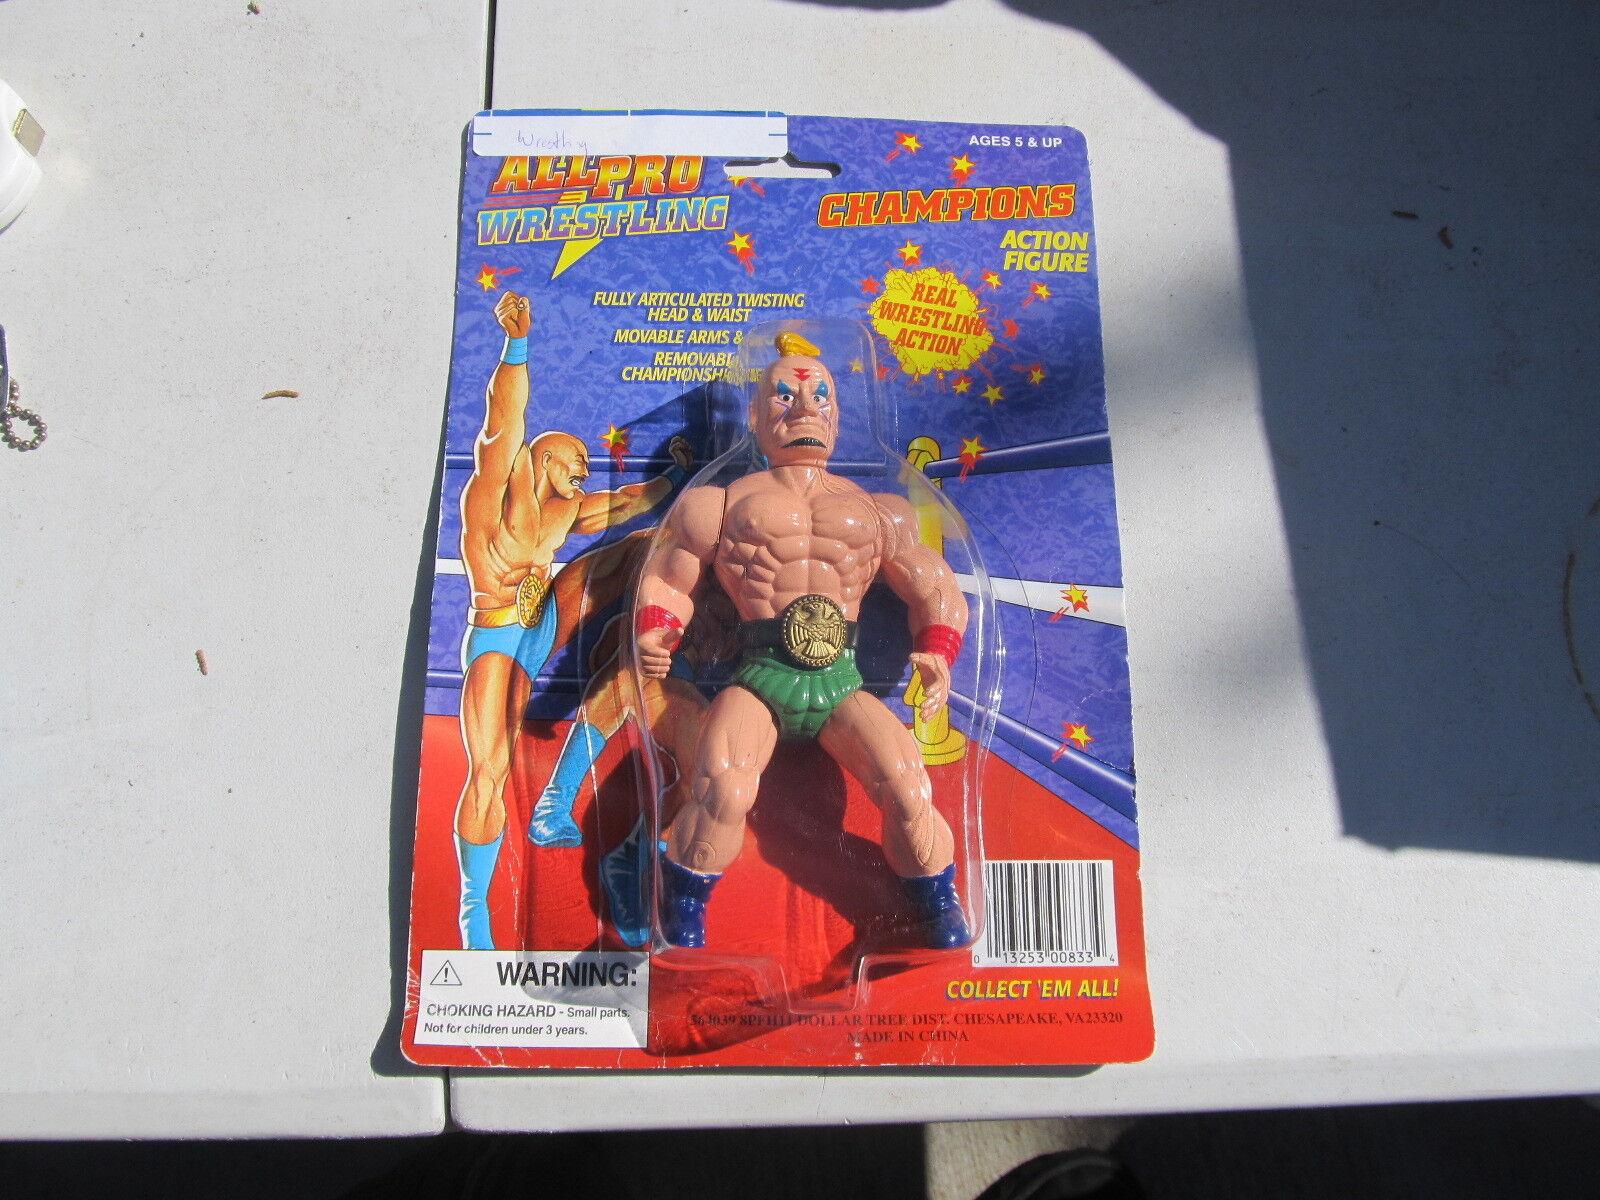 All Pro Wrestling Champions figure MINT ON CARD